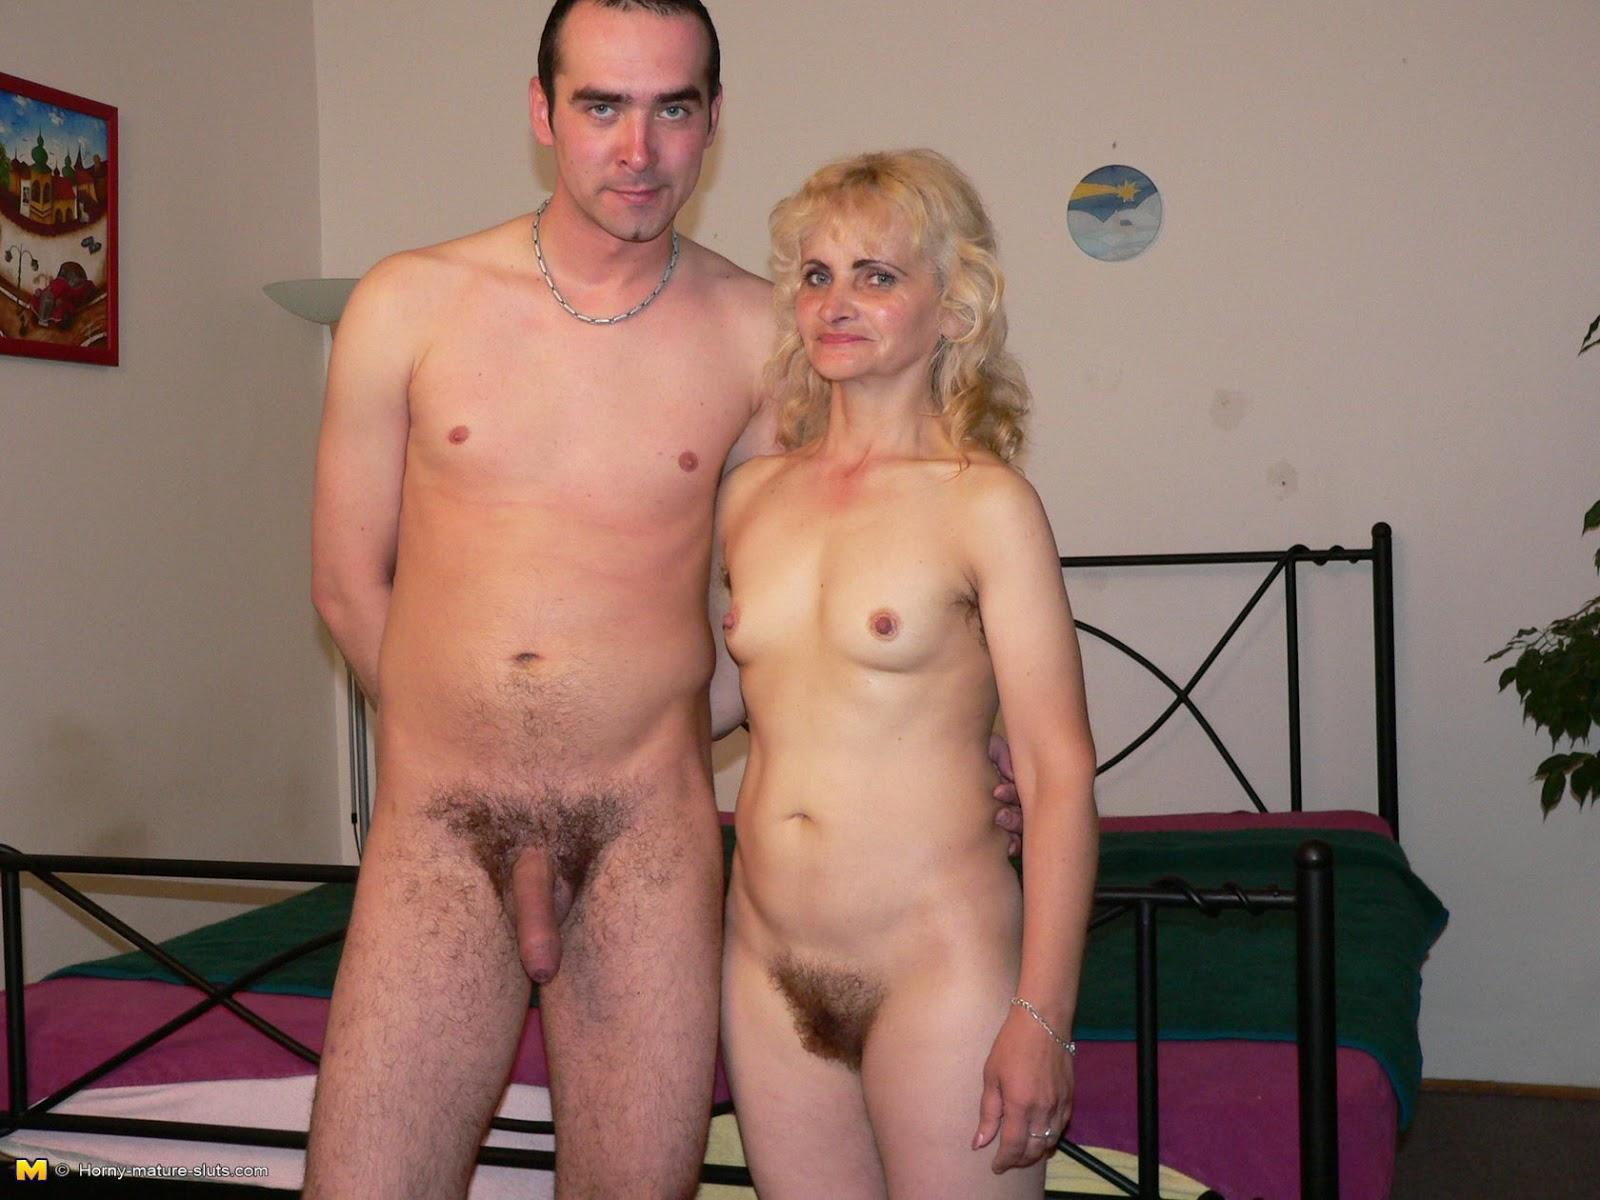 Women nude men and Category:Nude men